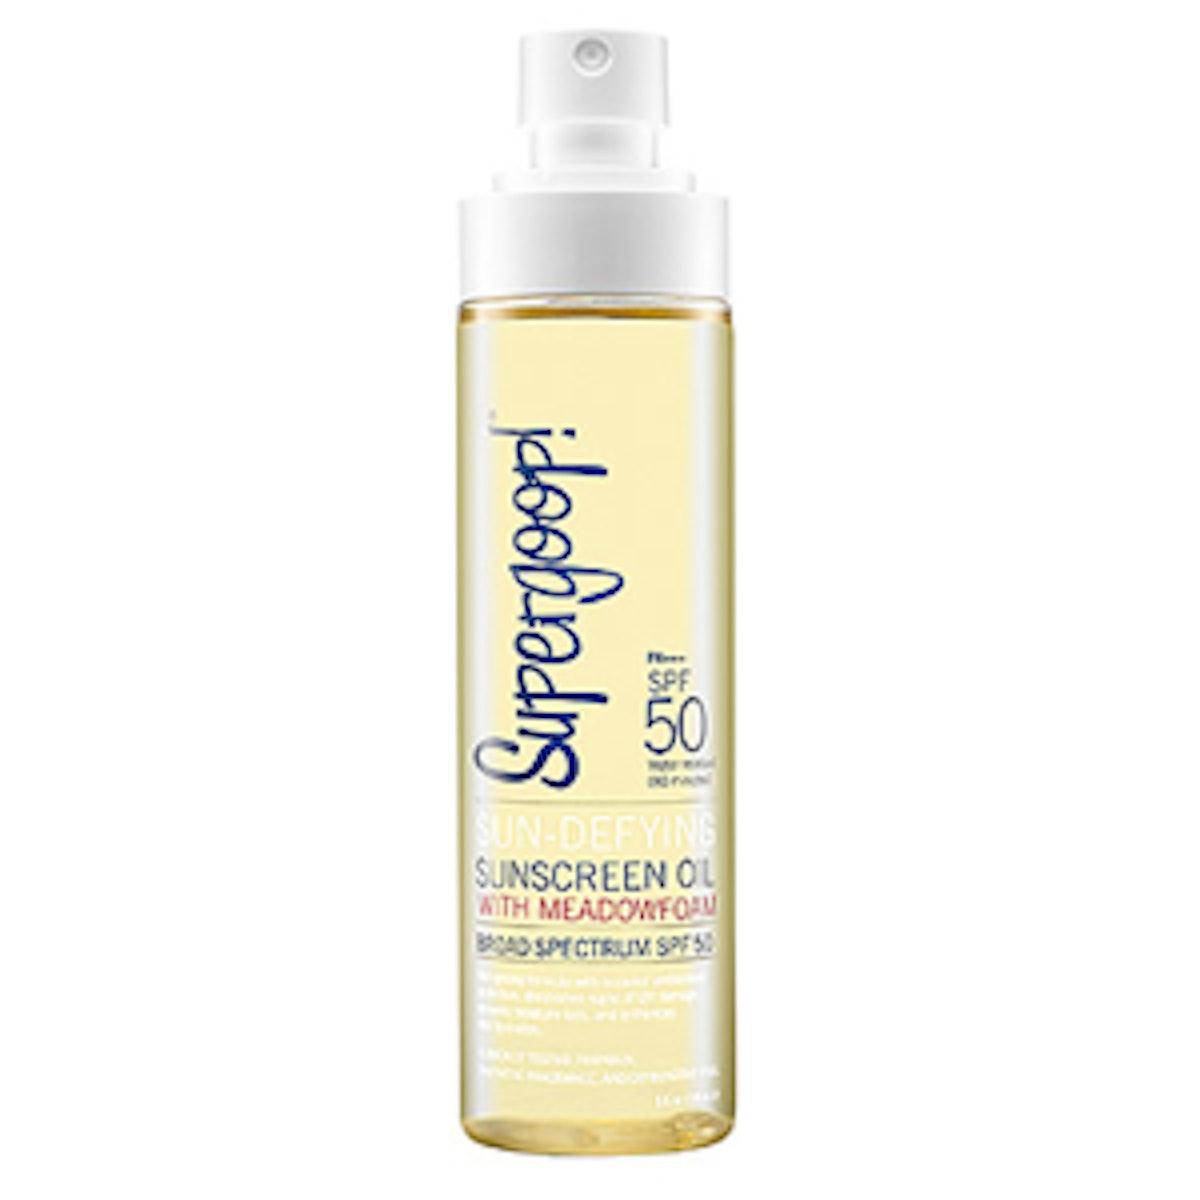 Sunscreen Oil SPF 50